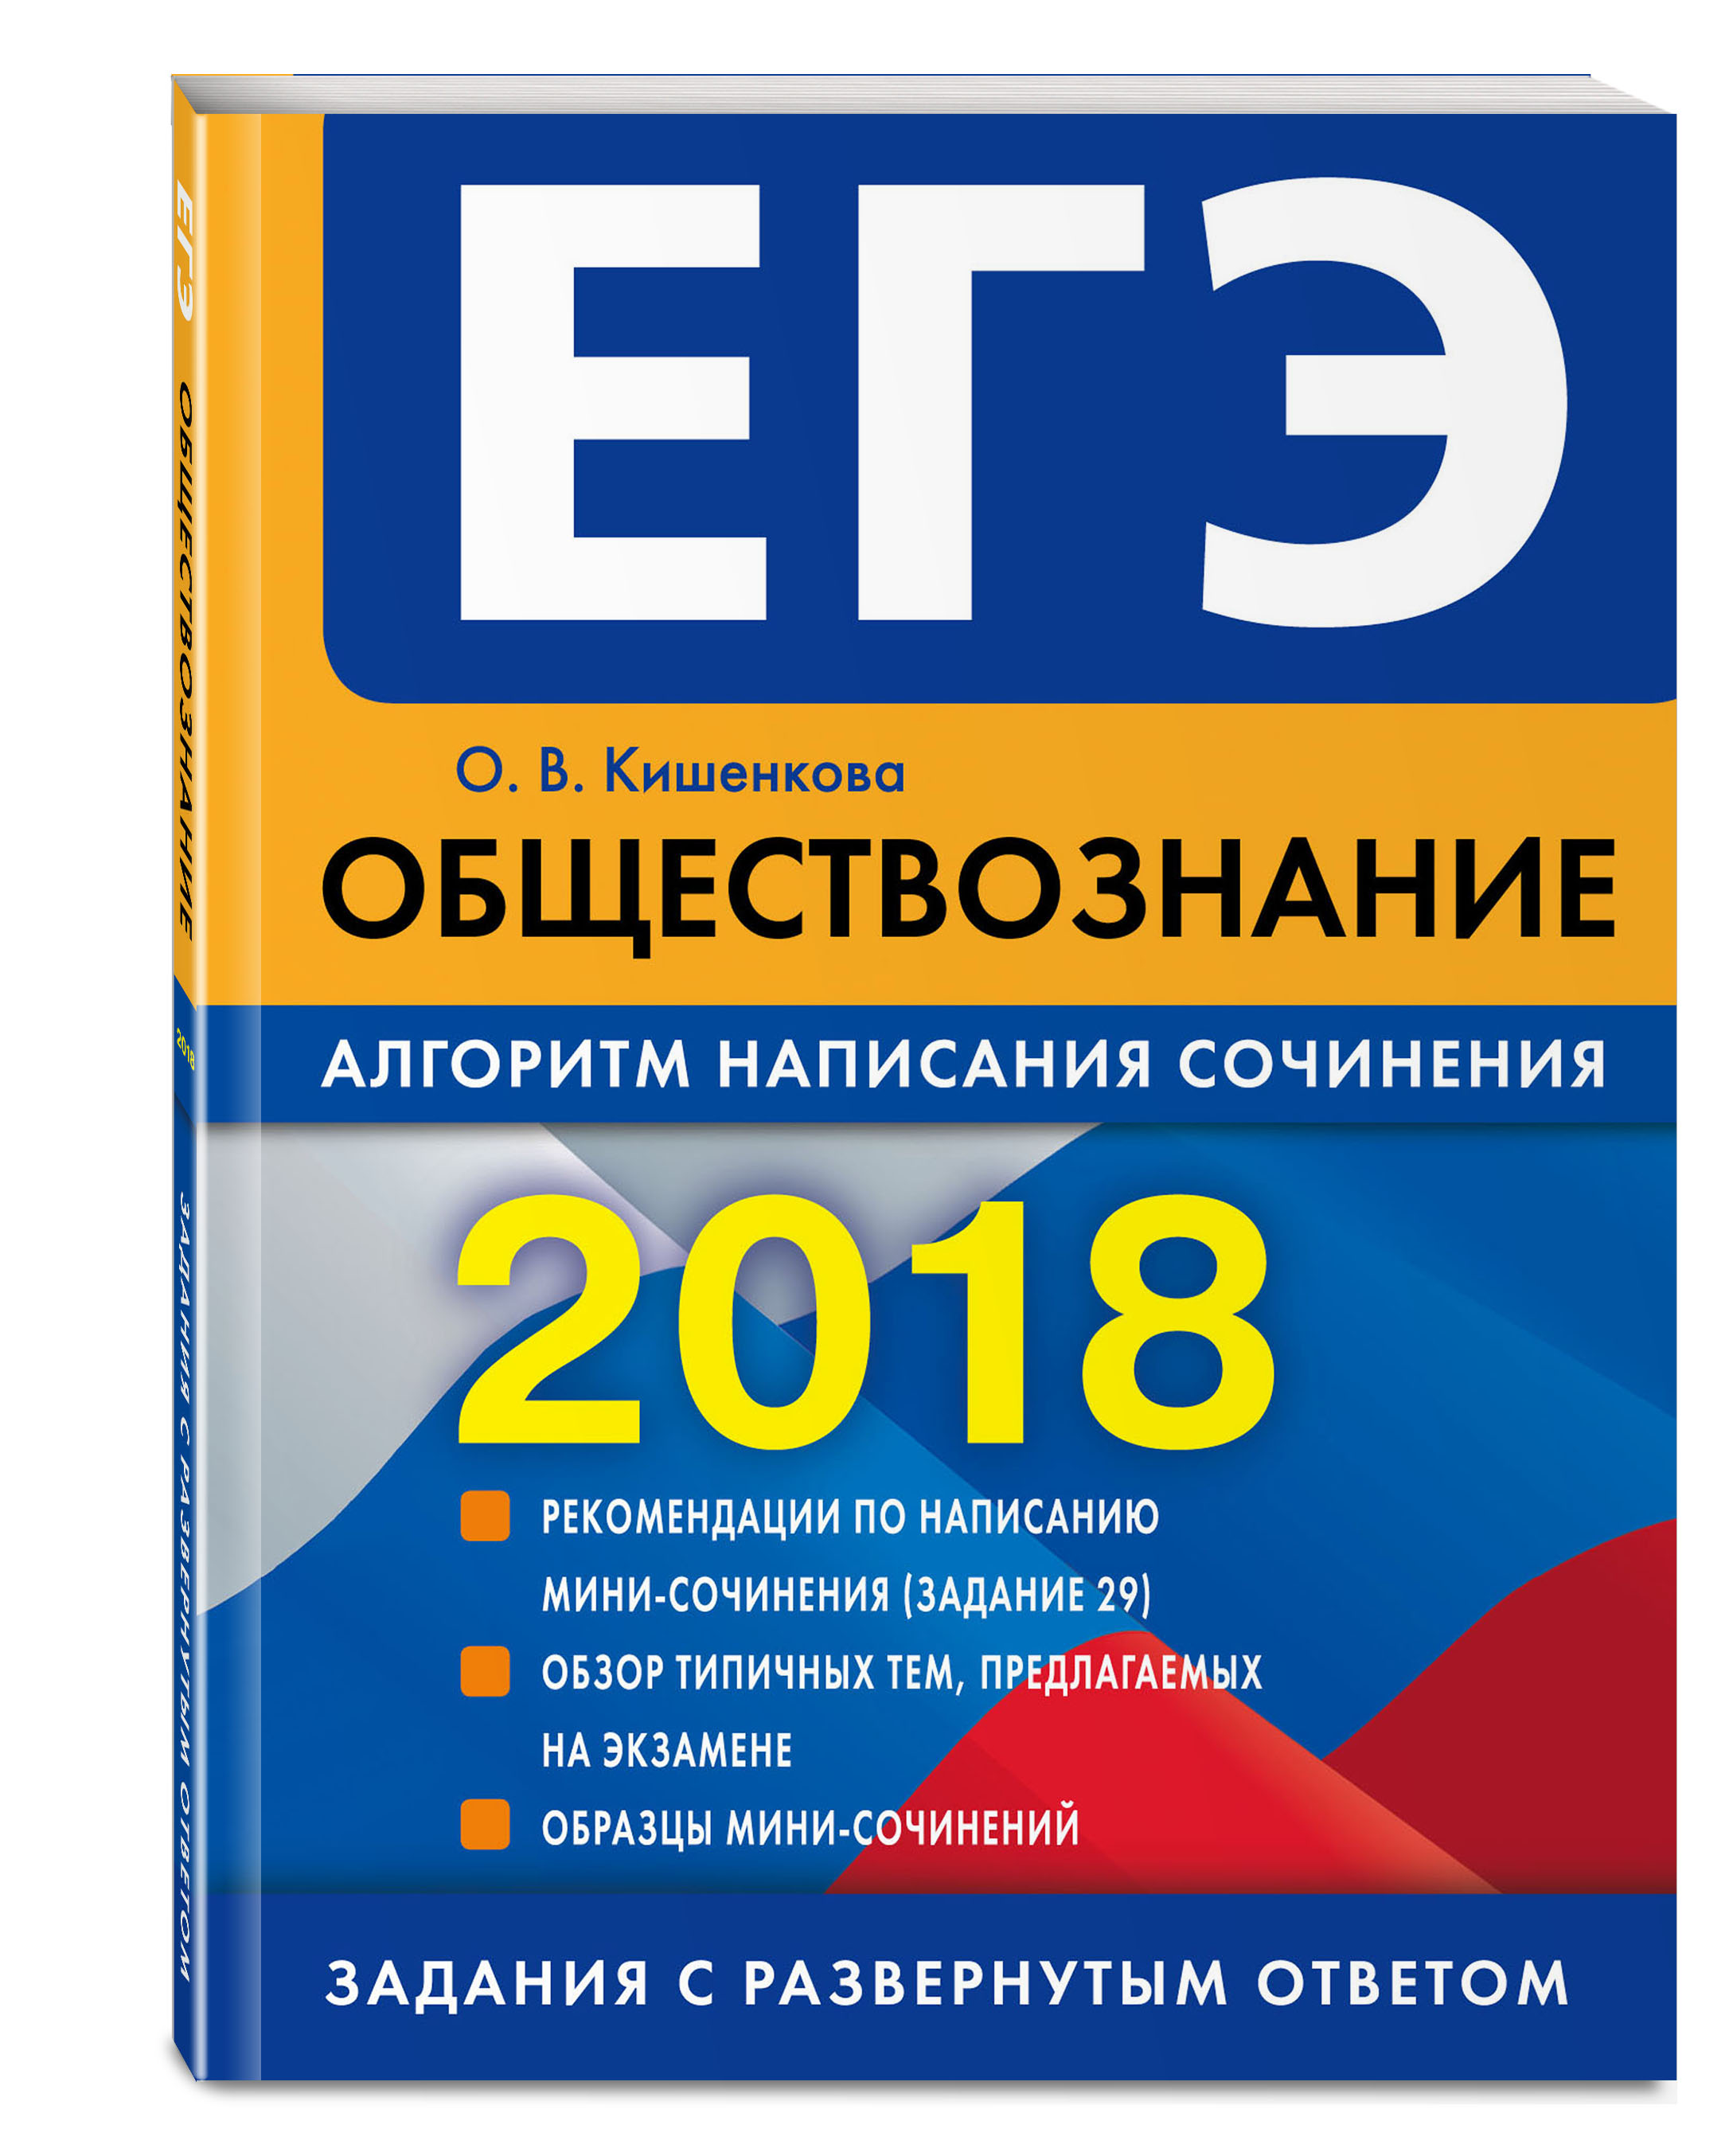 ЕГЭ-2018. Обществознание. Алгоритм написания сочинения ( Кишенкова О.В.  )